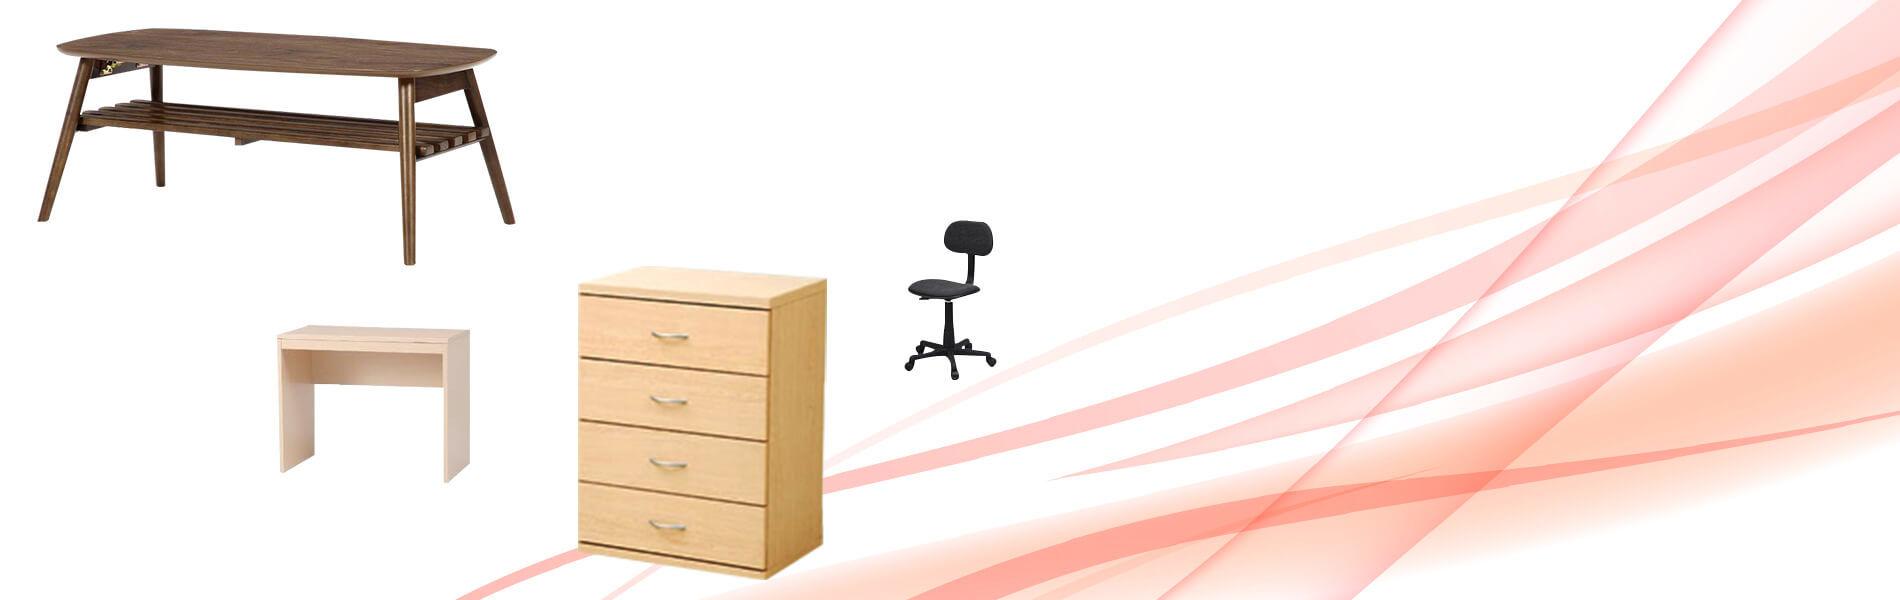 収納家具商品 生活家具商品 レンタル